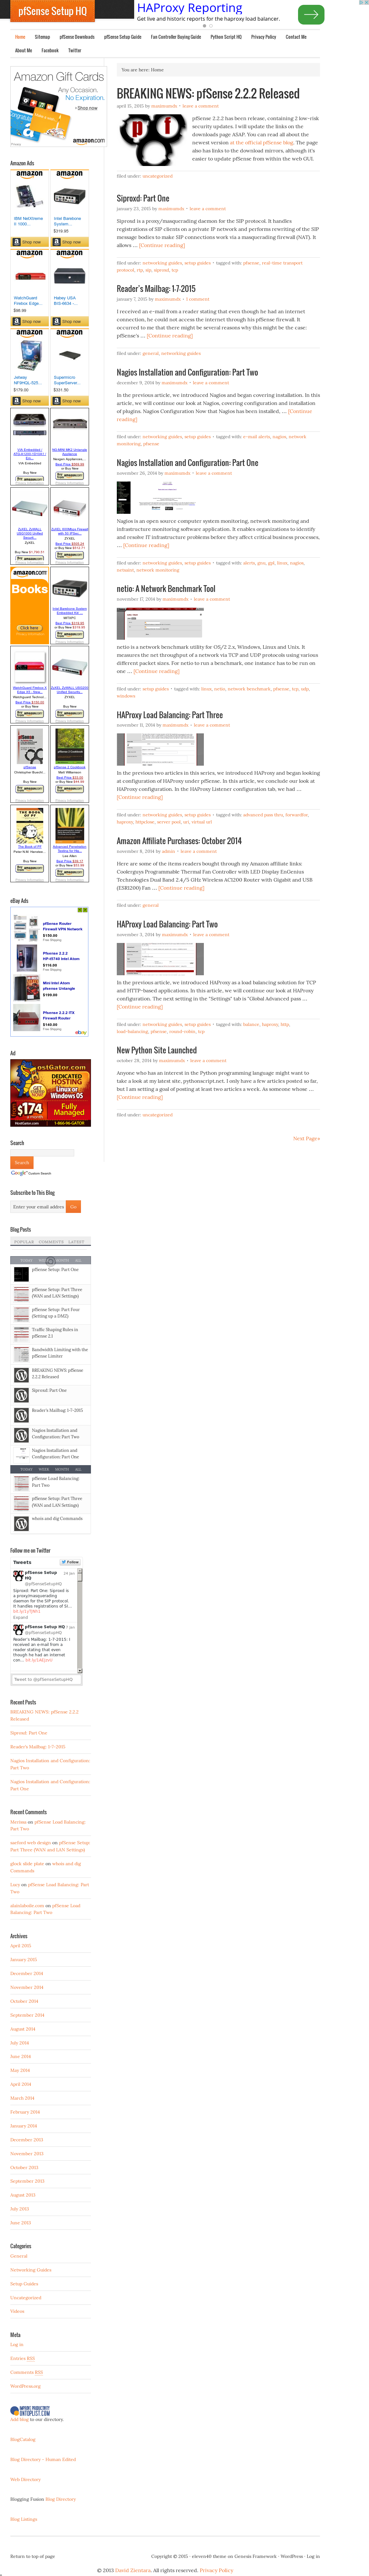 Pfsense Setup Hq Competitors, Revenue and Employees - Owler